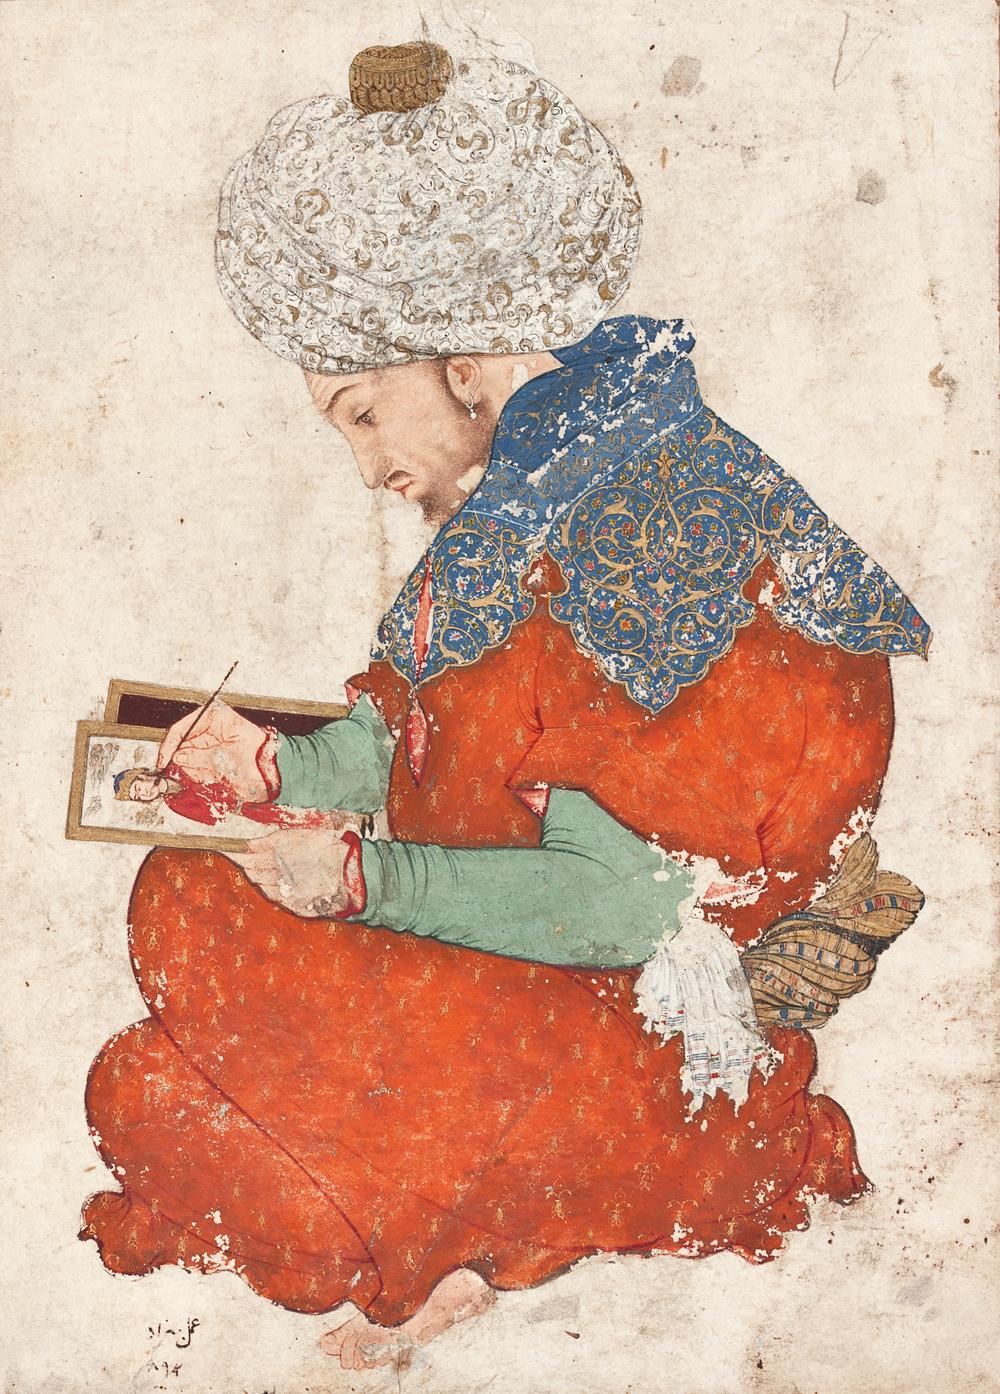 Portrait of an artist, Iran or Mughal India, late sixteenth century CE Cat. 35 (LNS 57 MS) © The al-Sabah Collection, Dar al-Athar al-Islamiyyah, Kuwait